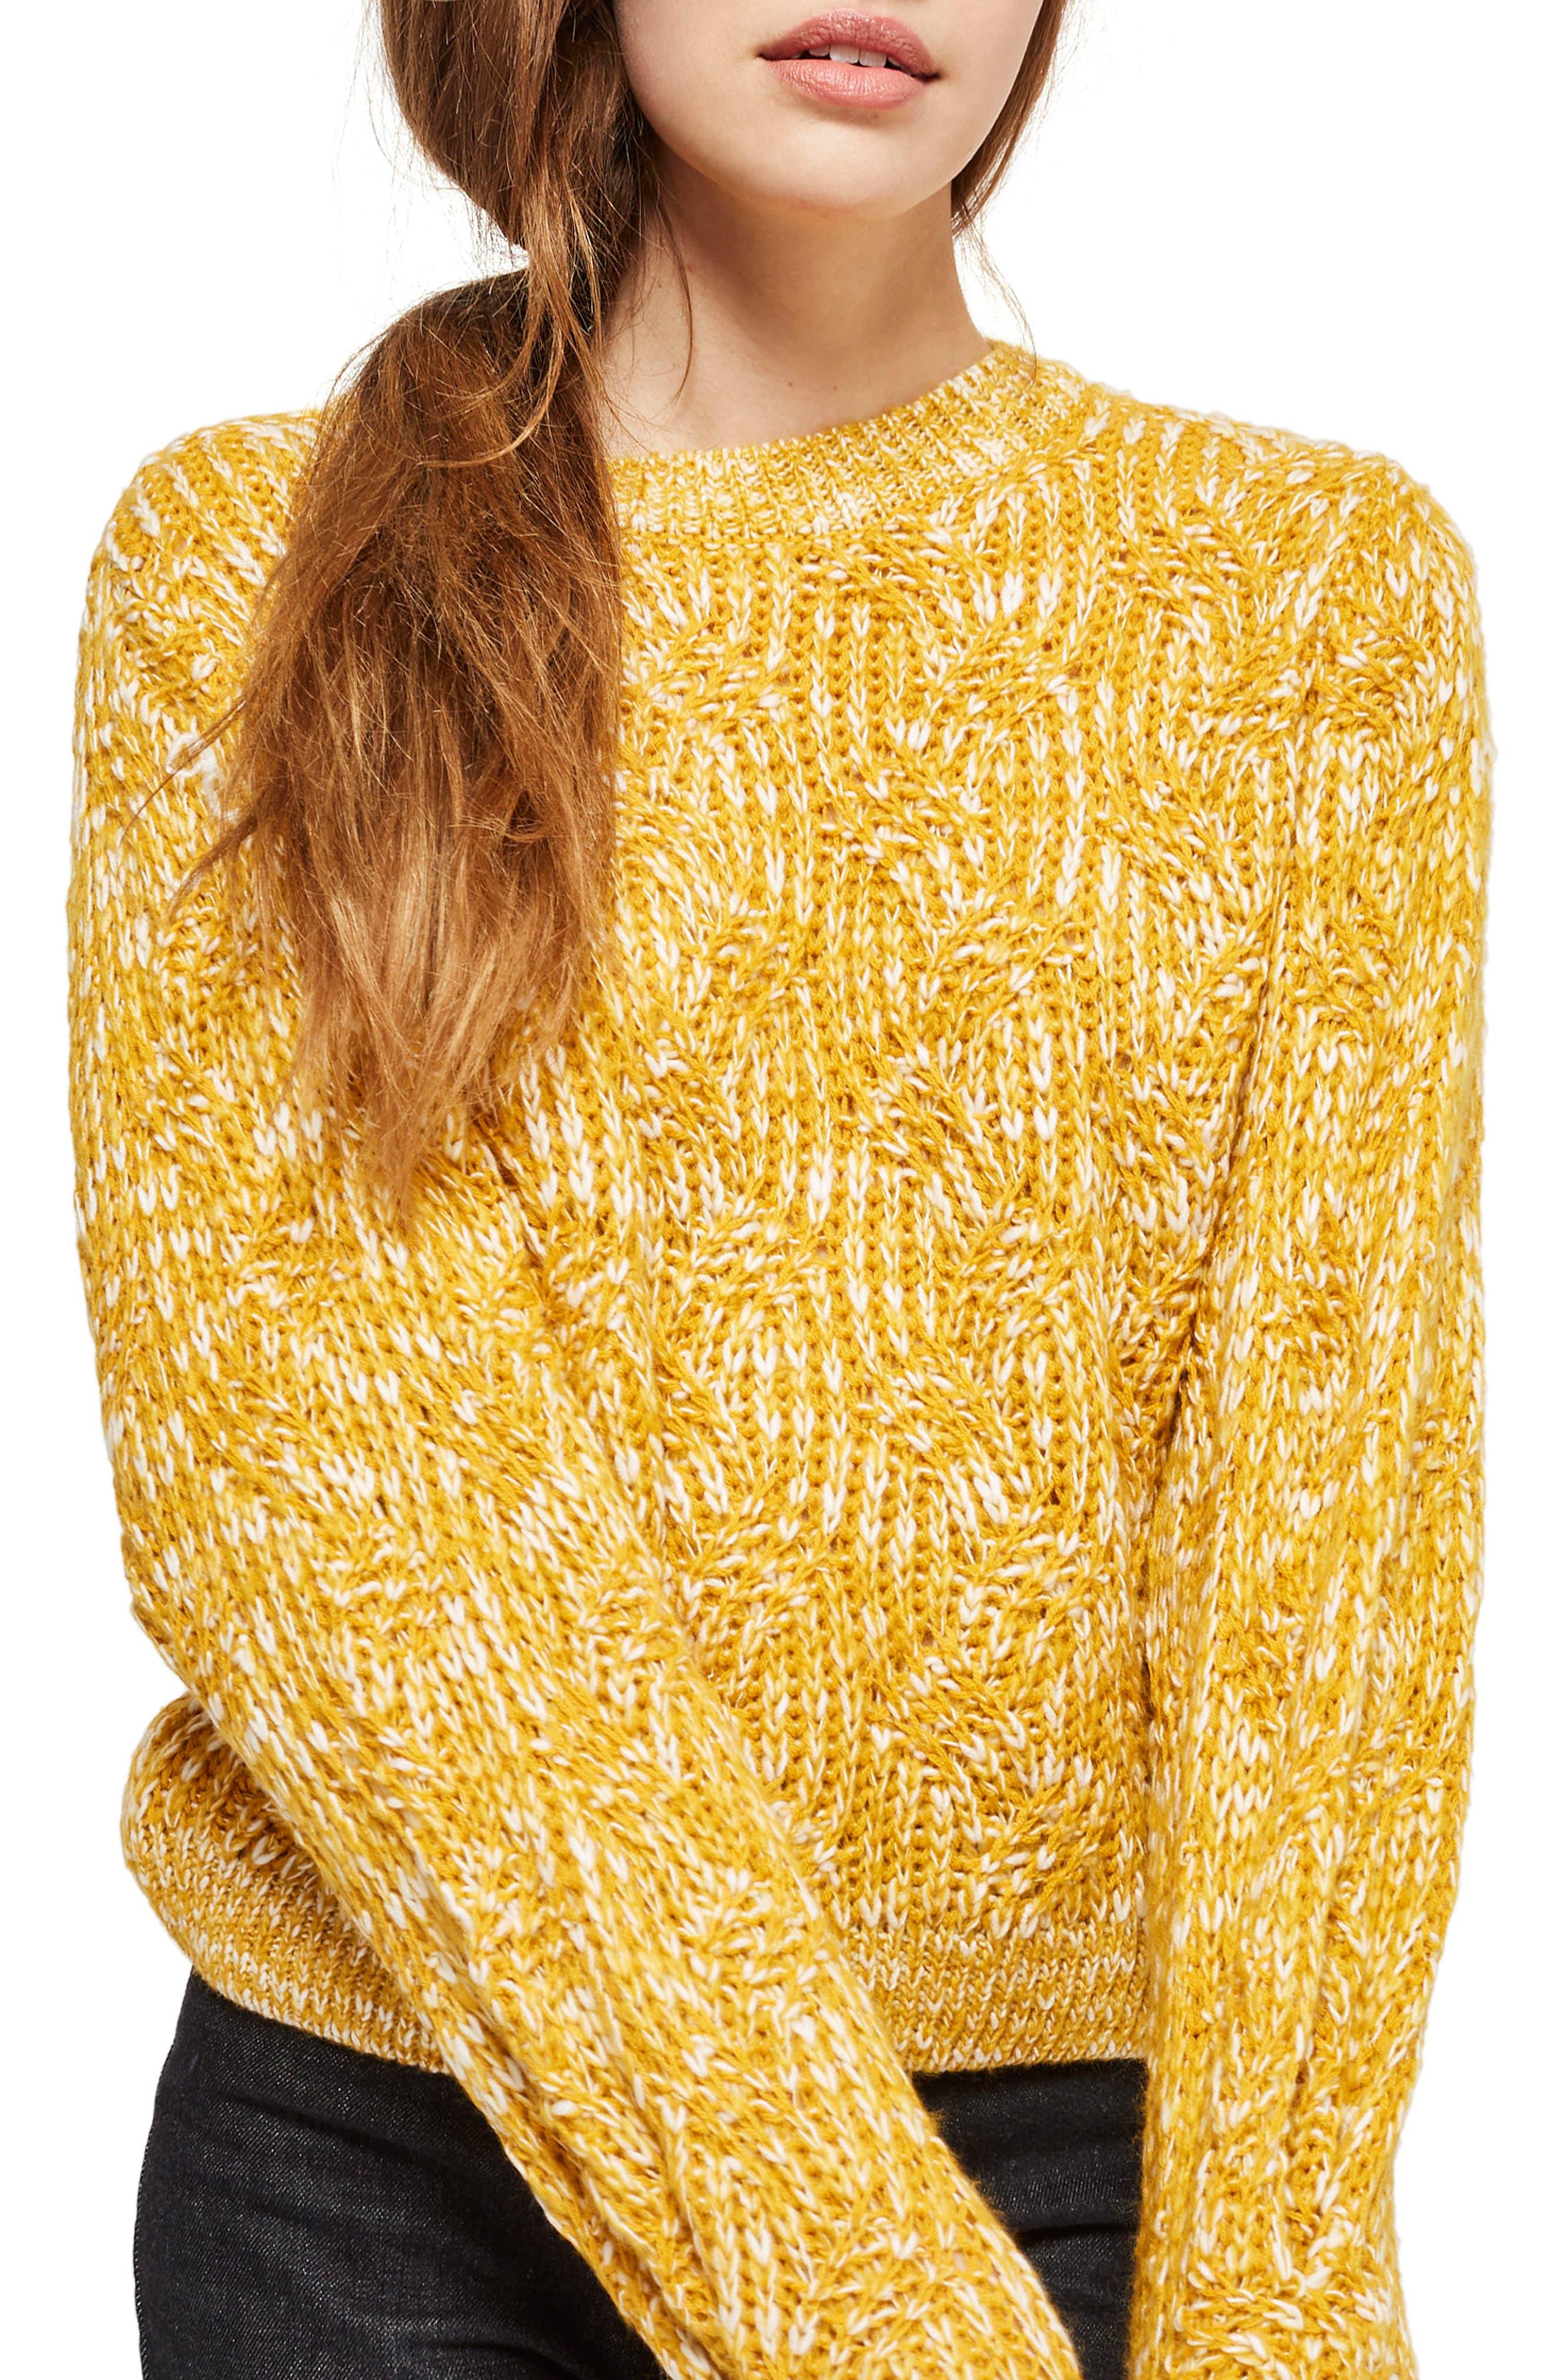 Topshop Swirl Tuck Sweater